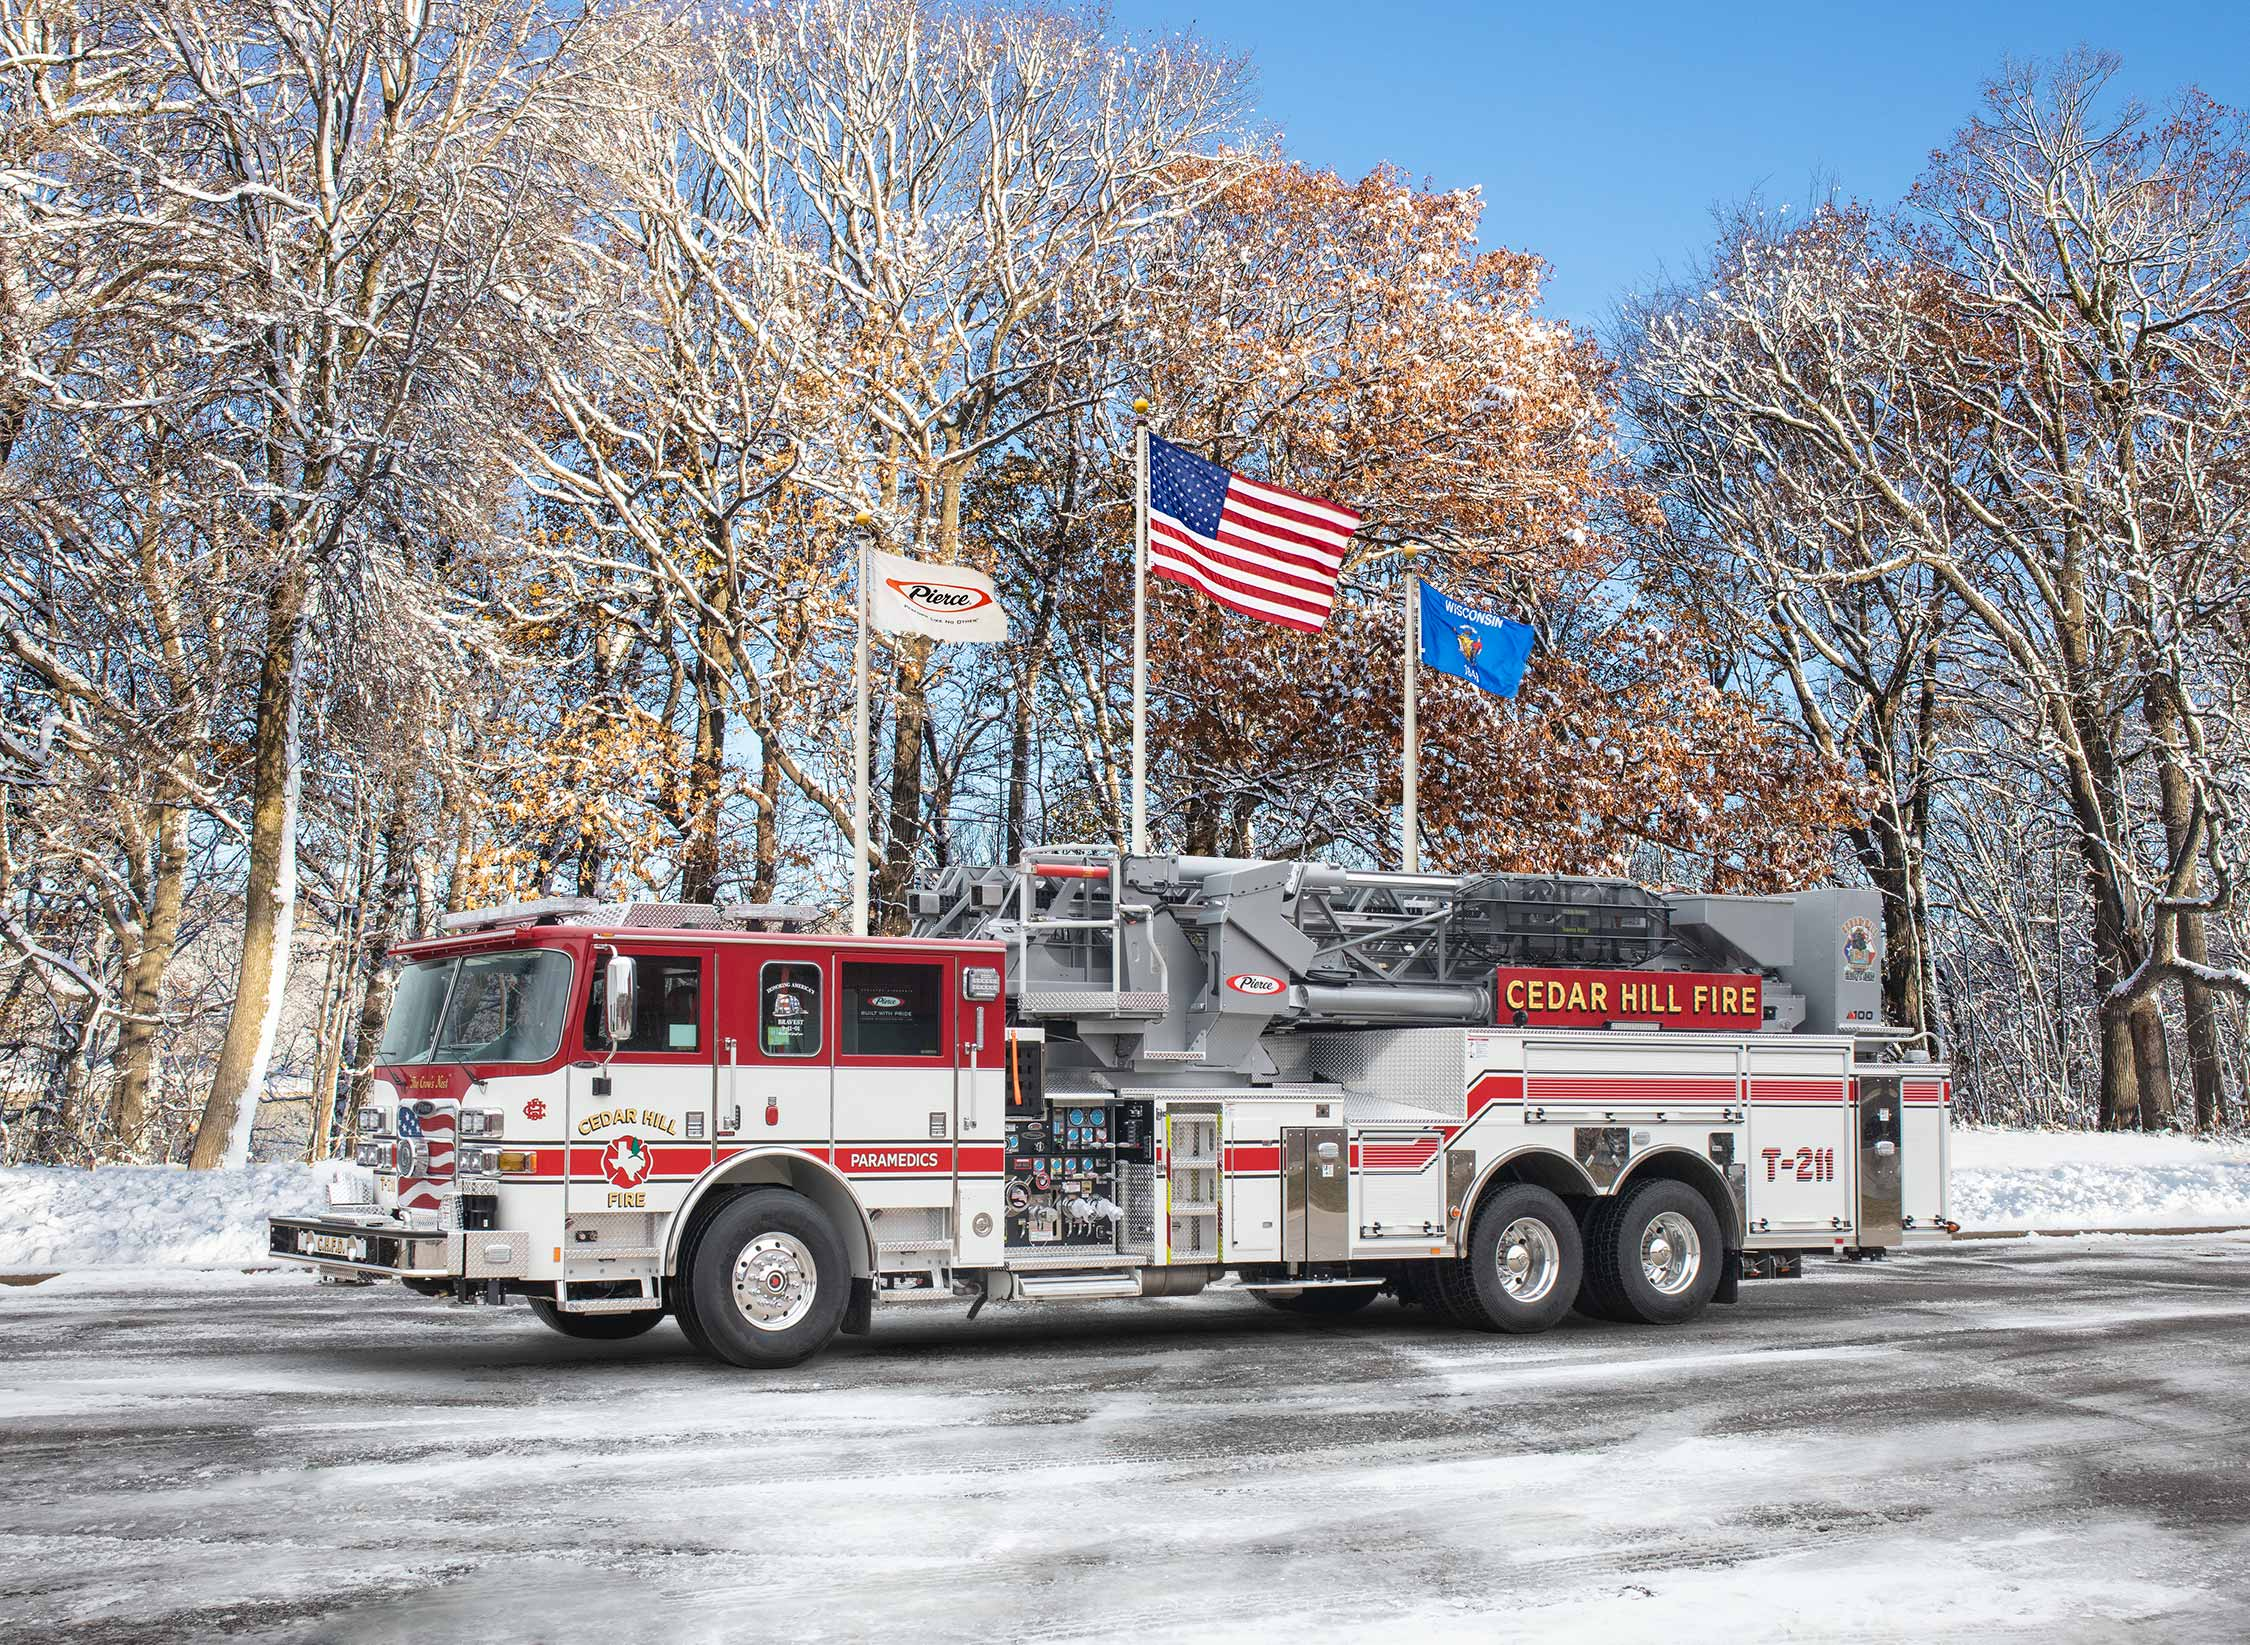 Cedar Hill Fire Department - Aerial